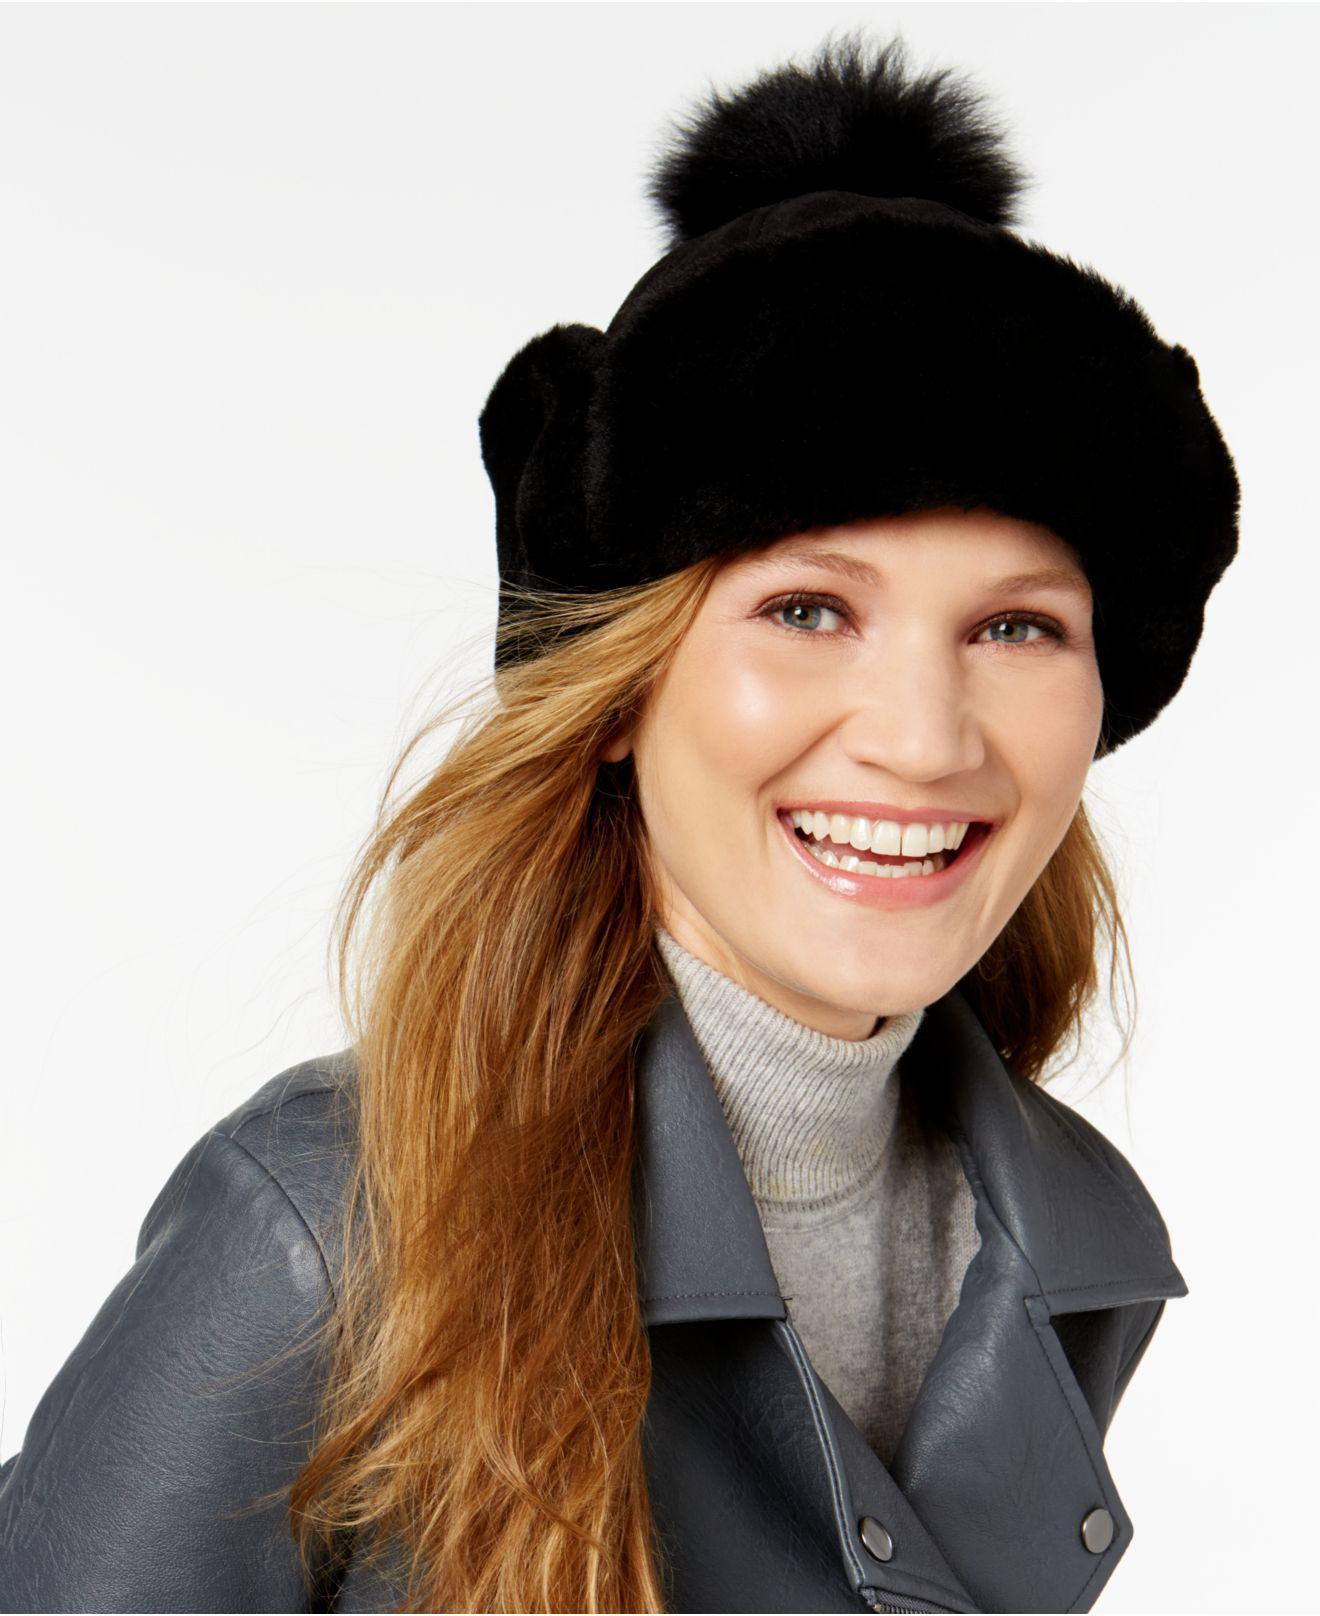 Lyst - UGG Shearling Pom Pom Hat in Black 1c308789bb6